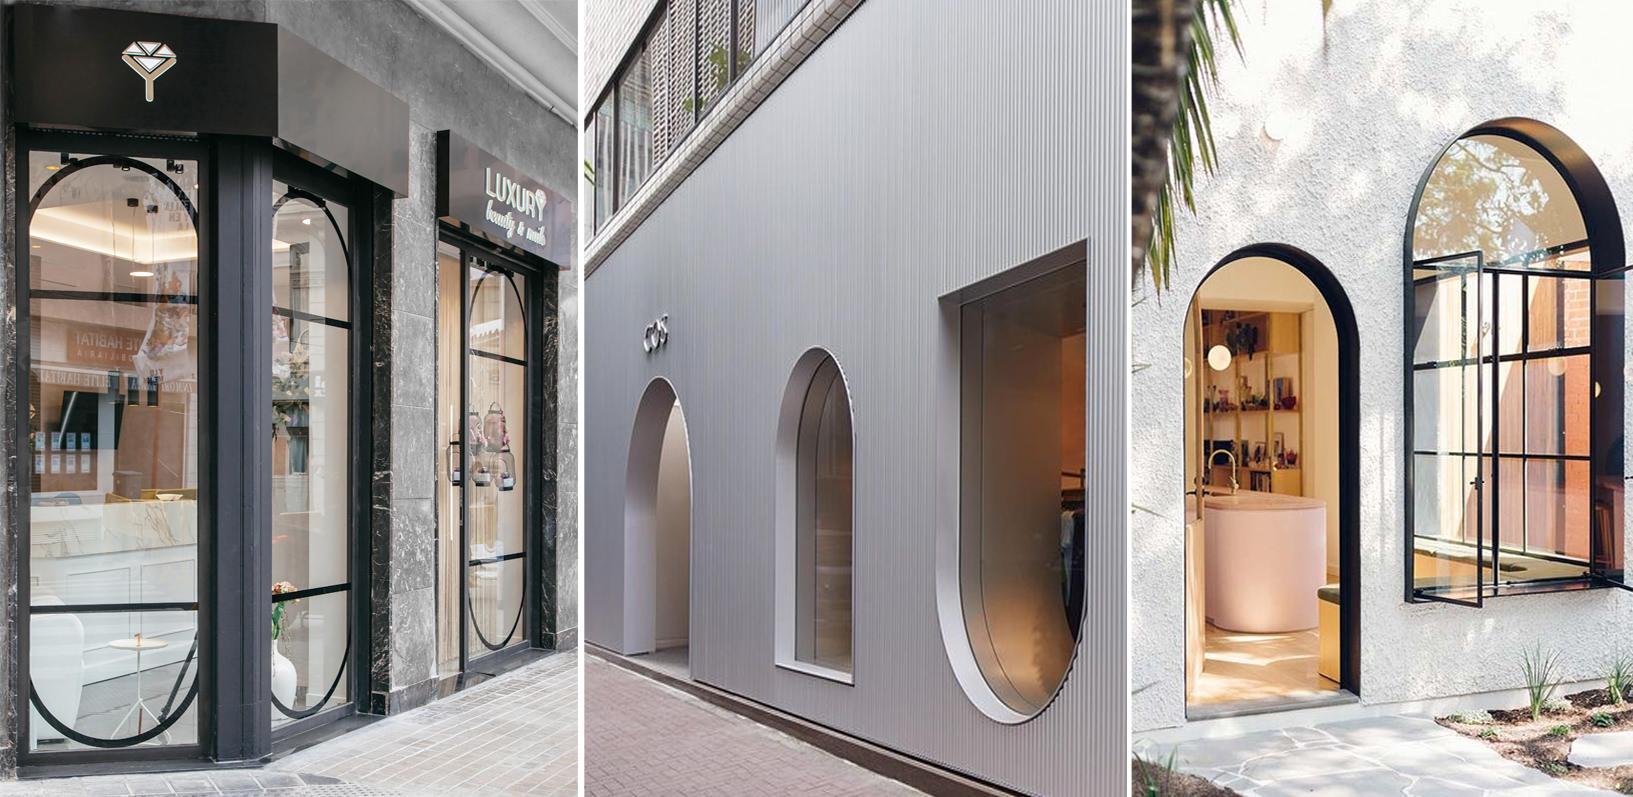 Diseños con arcos en fachadas